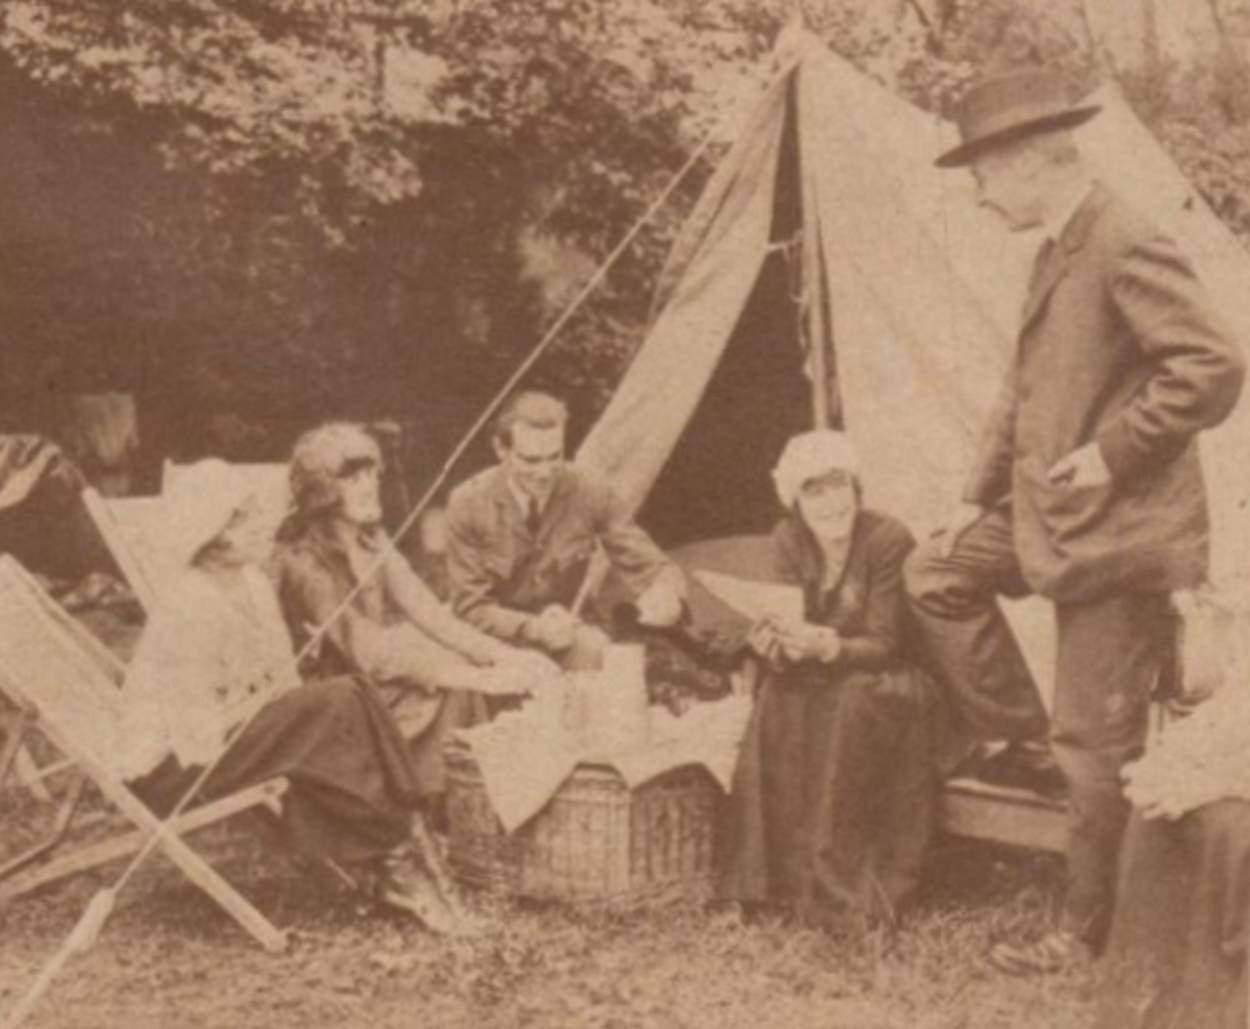 1919-07-06_Le Miroir_La grande vogue du camping en Angleterre_cover